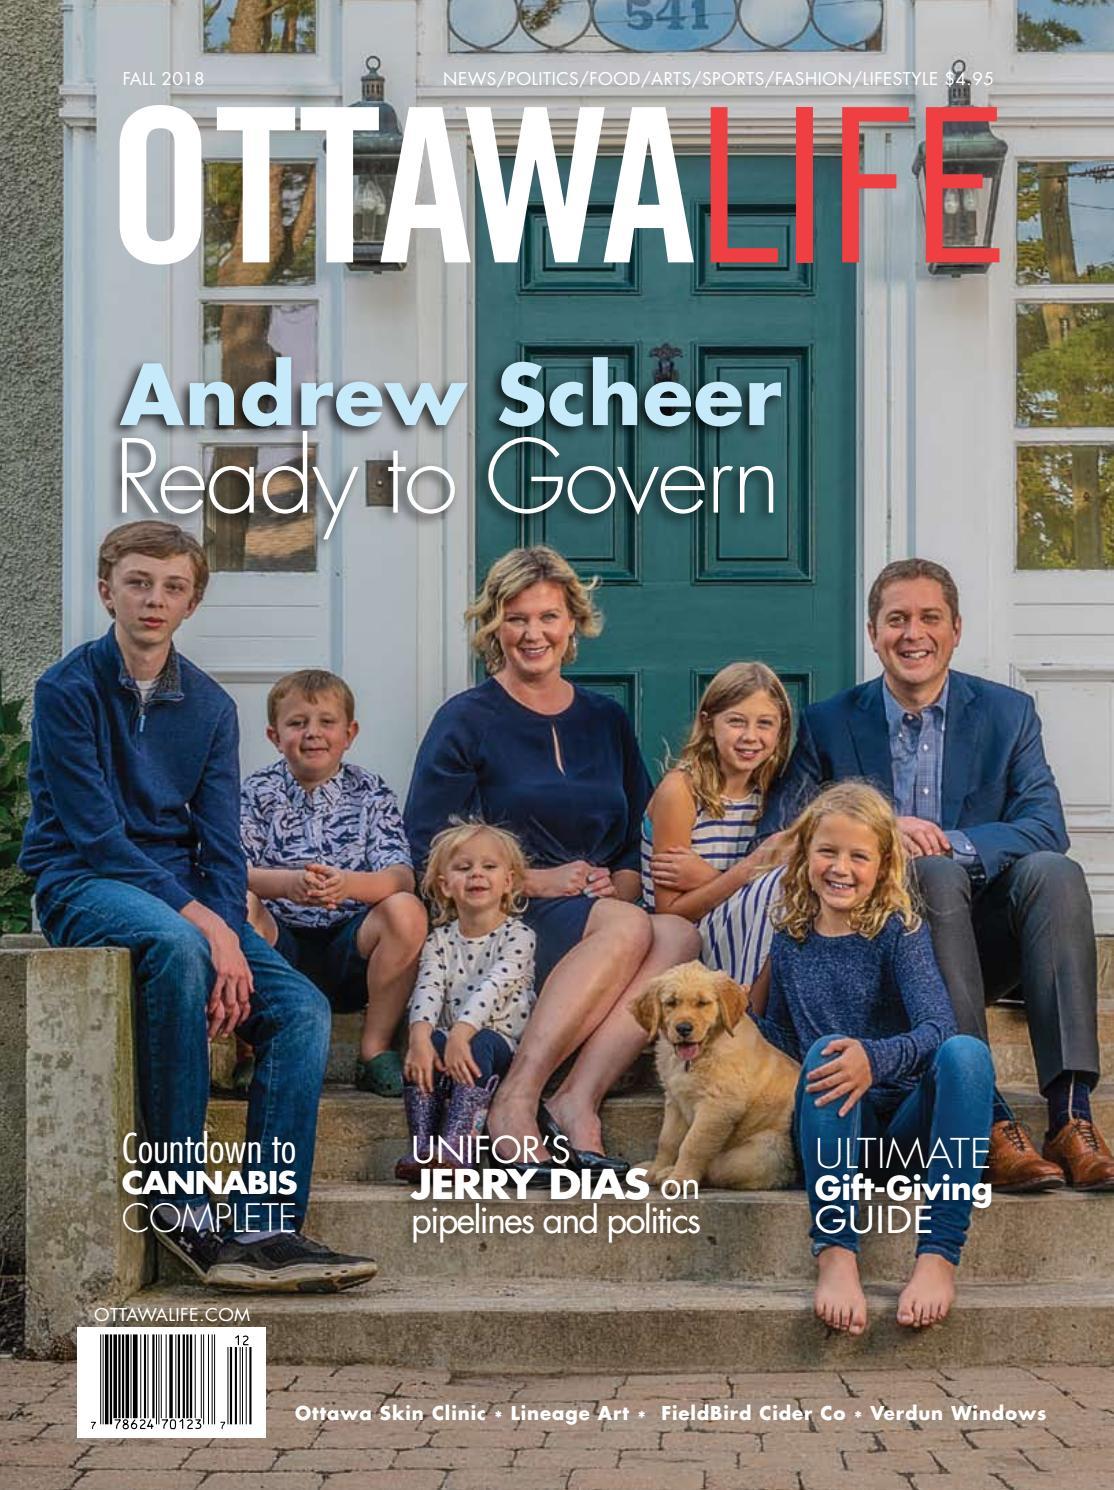 Fall 2018 By Ottawa Life Magazine Issuu Free Heater Circuit Rosemary Ainslie Basiccircuit